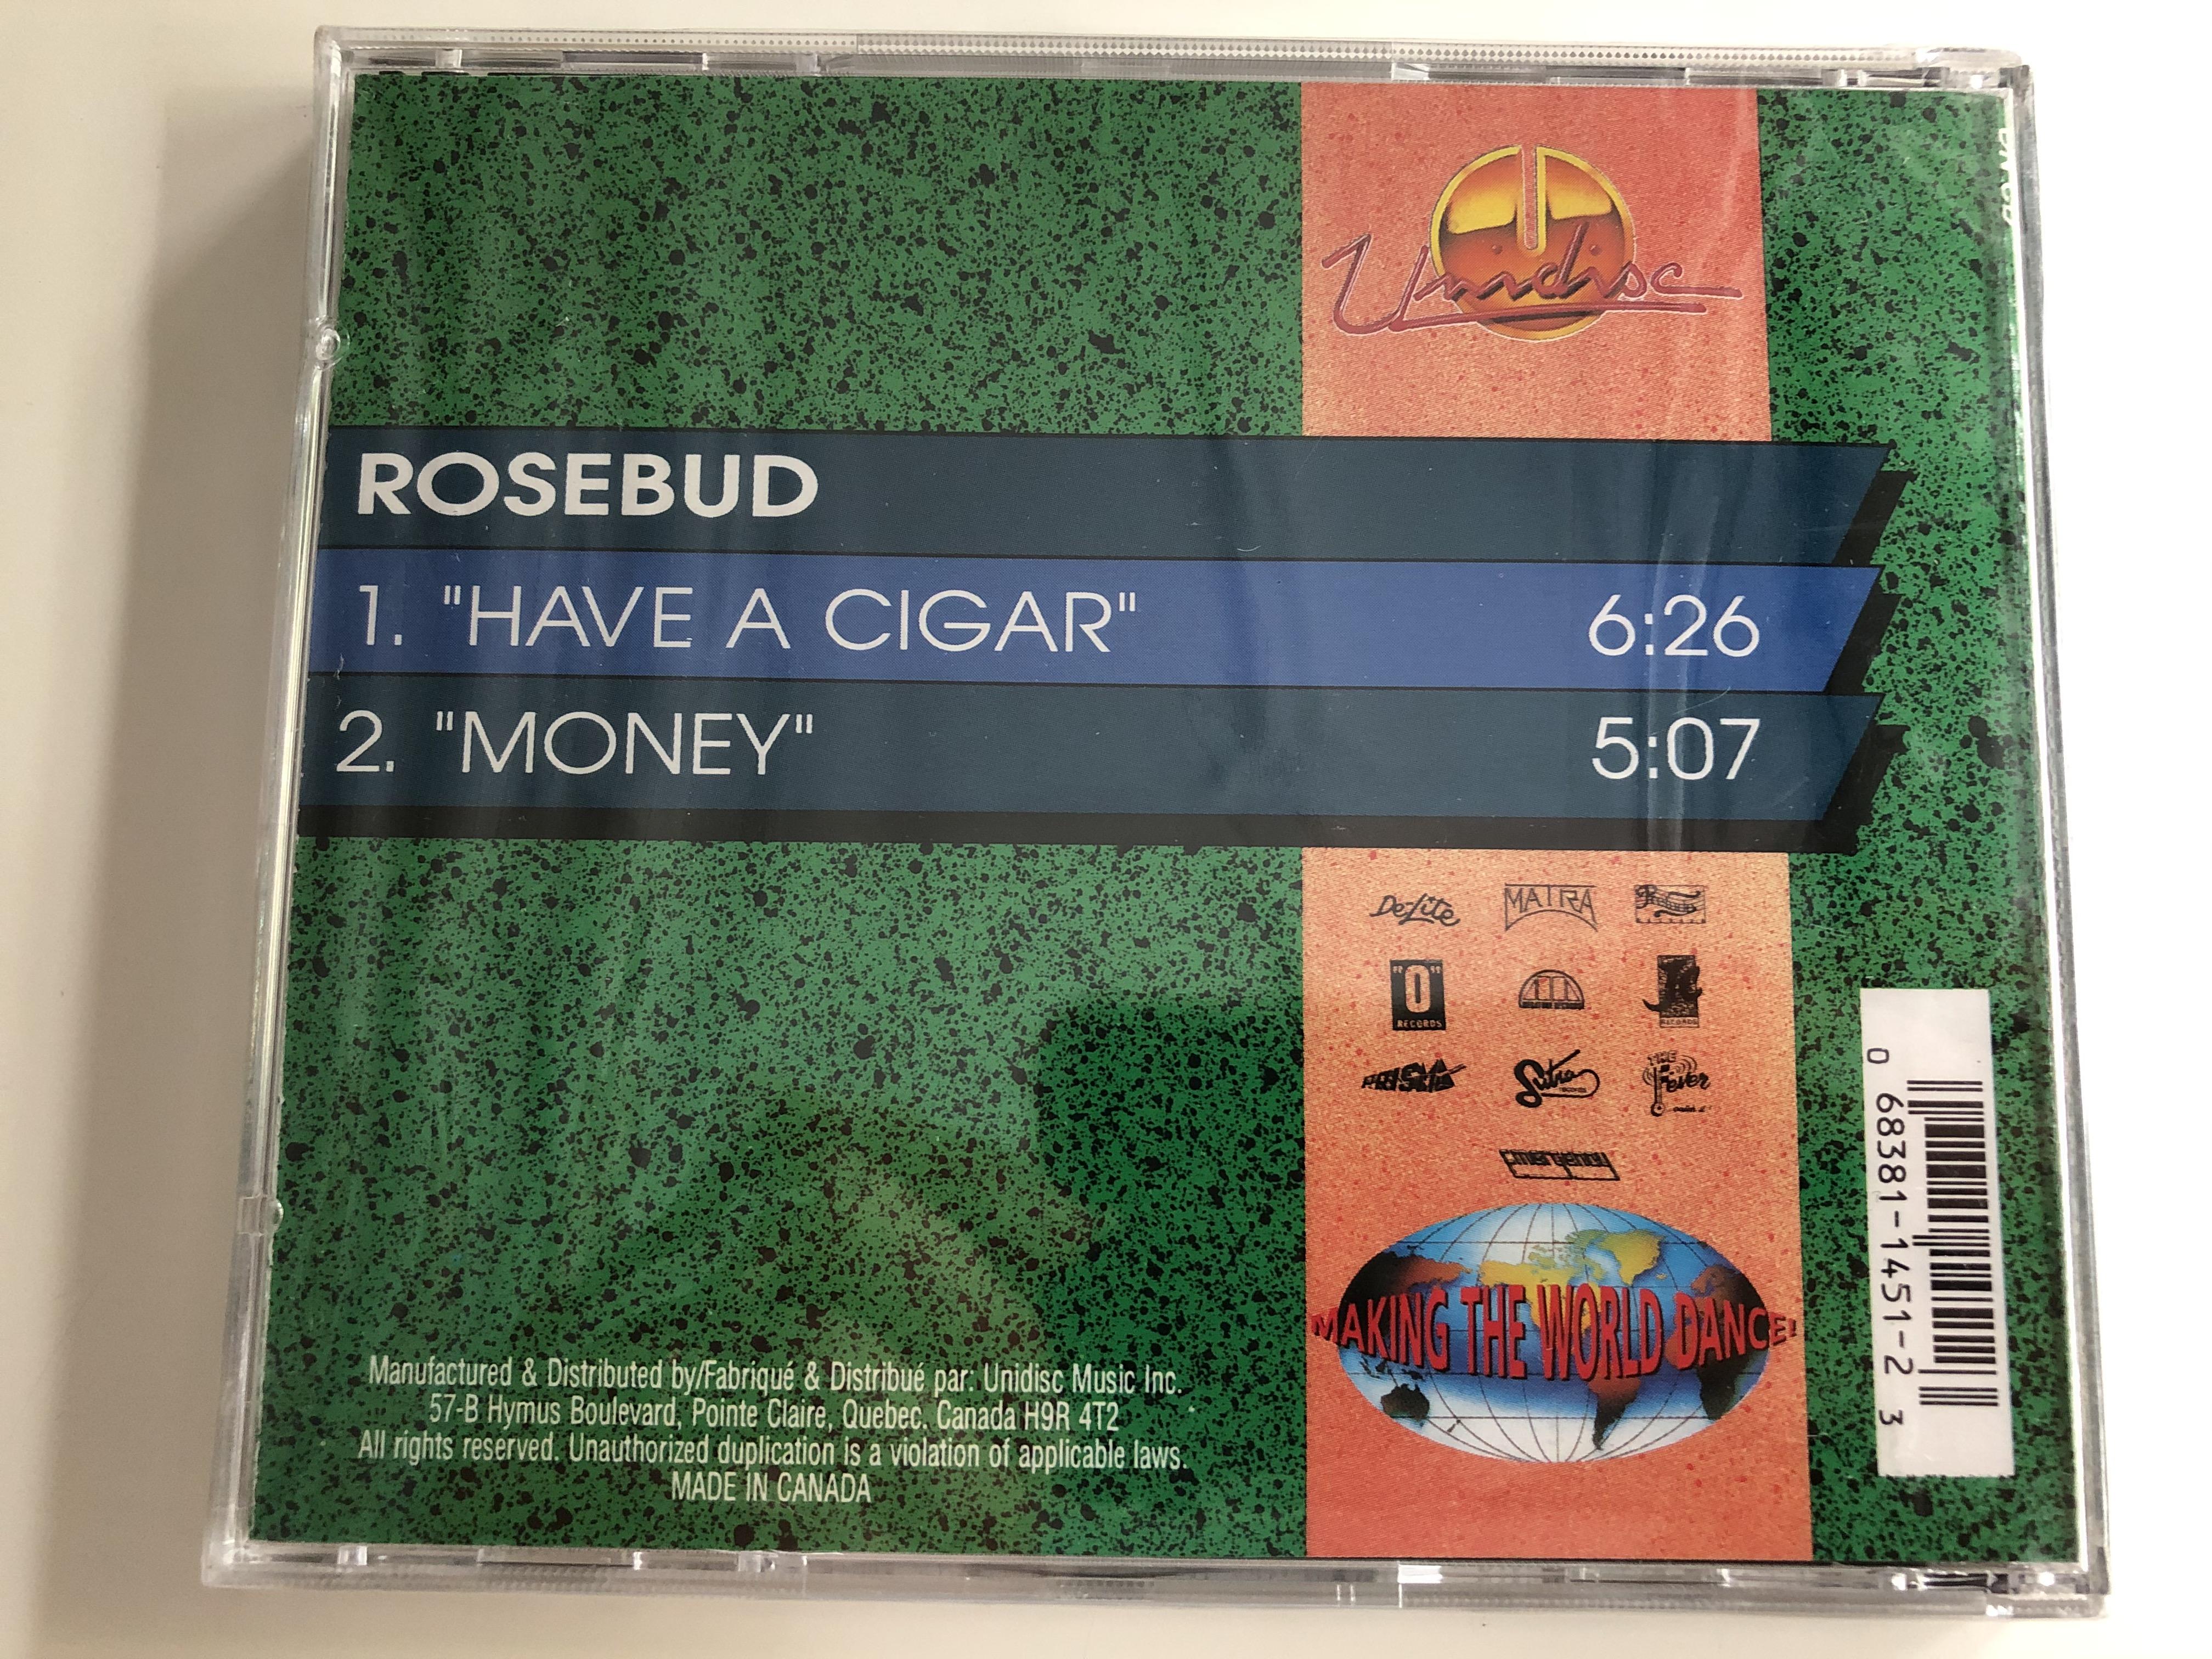 rosebud-have-a-cigar-money-12-inch-classics-on-cd-unidisc-audio-cd-sp5-1451-2-.jpg